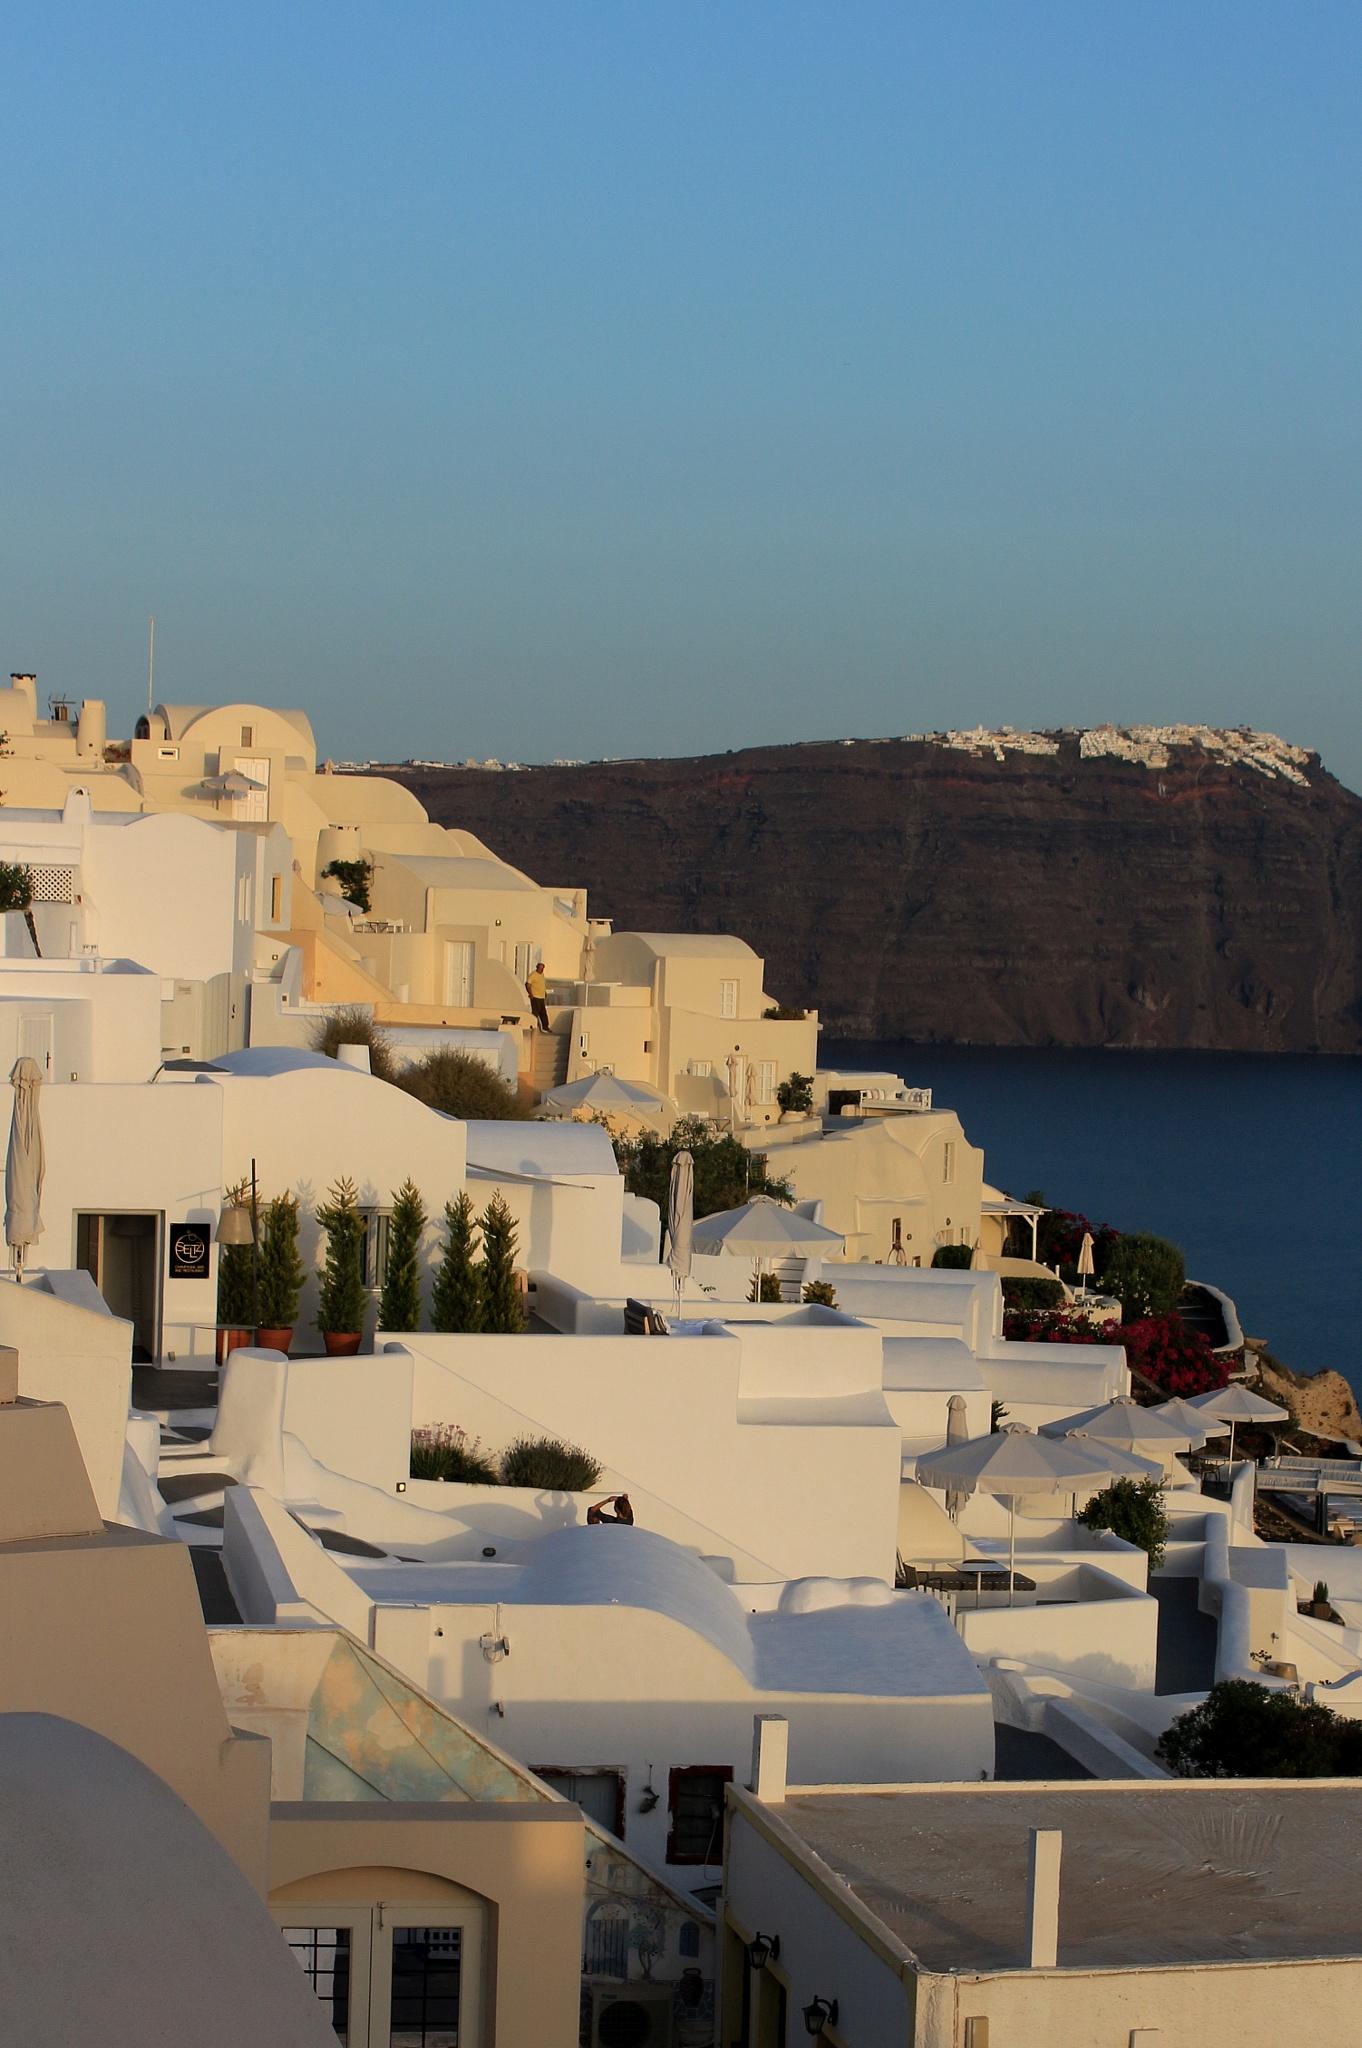 Oia, Santorini by katze